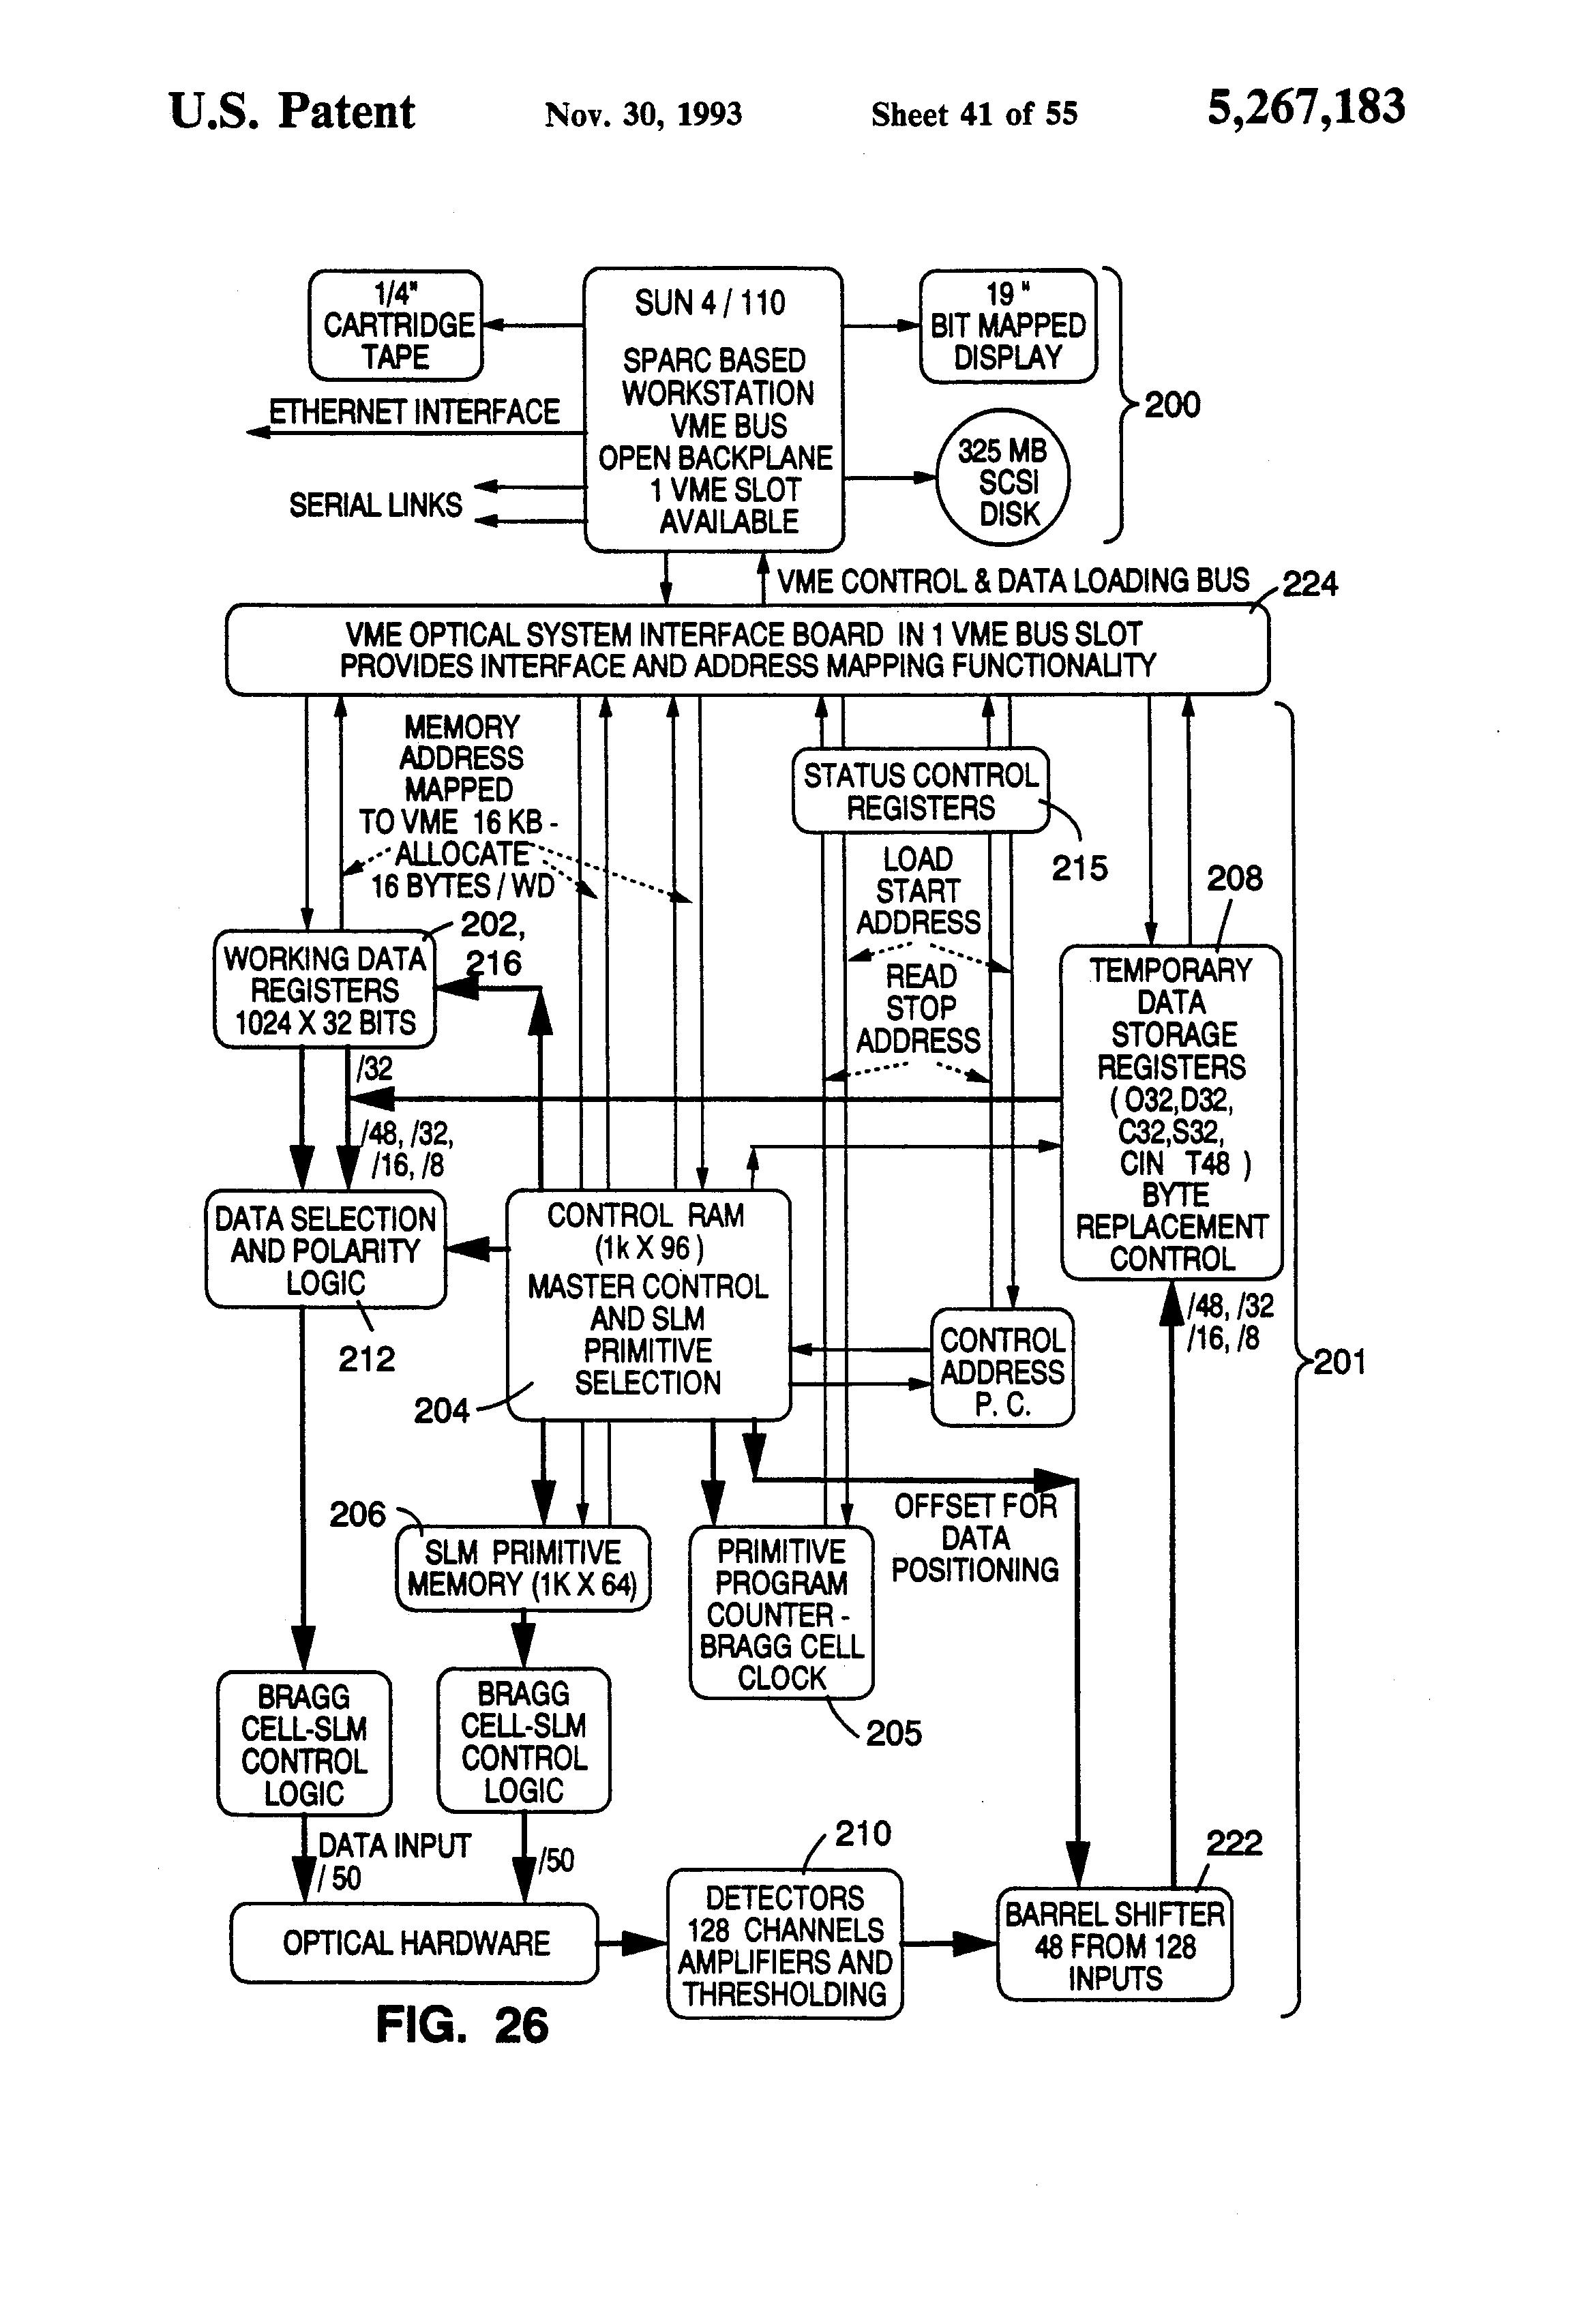 Patent Us5267183 General Purpose Optical Computer Google Patenten Counter Circuit 4 Bit Carry Look Ahead Adder Lcd Display Drawing